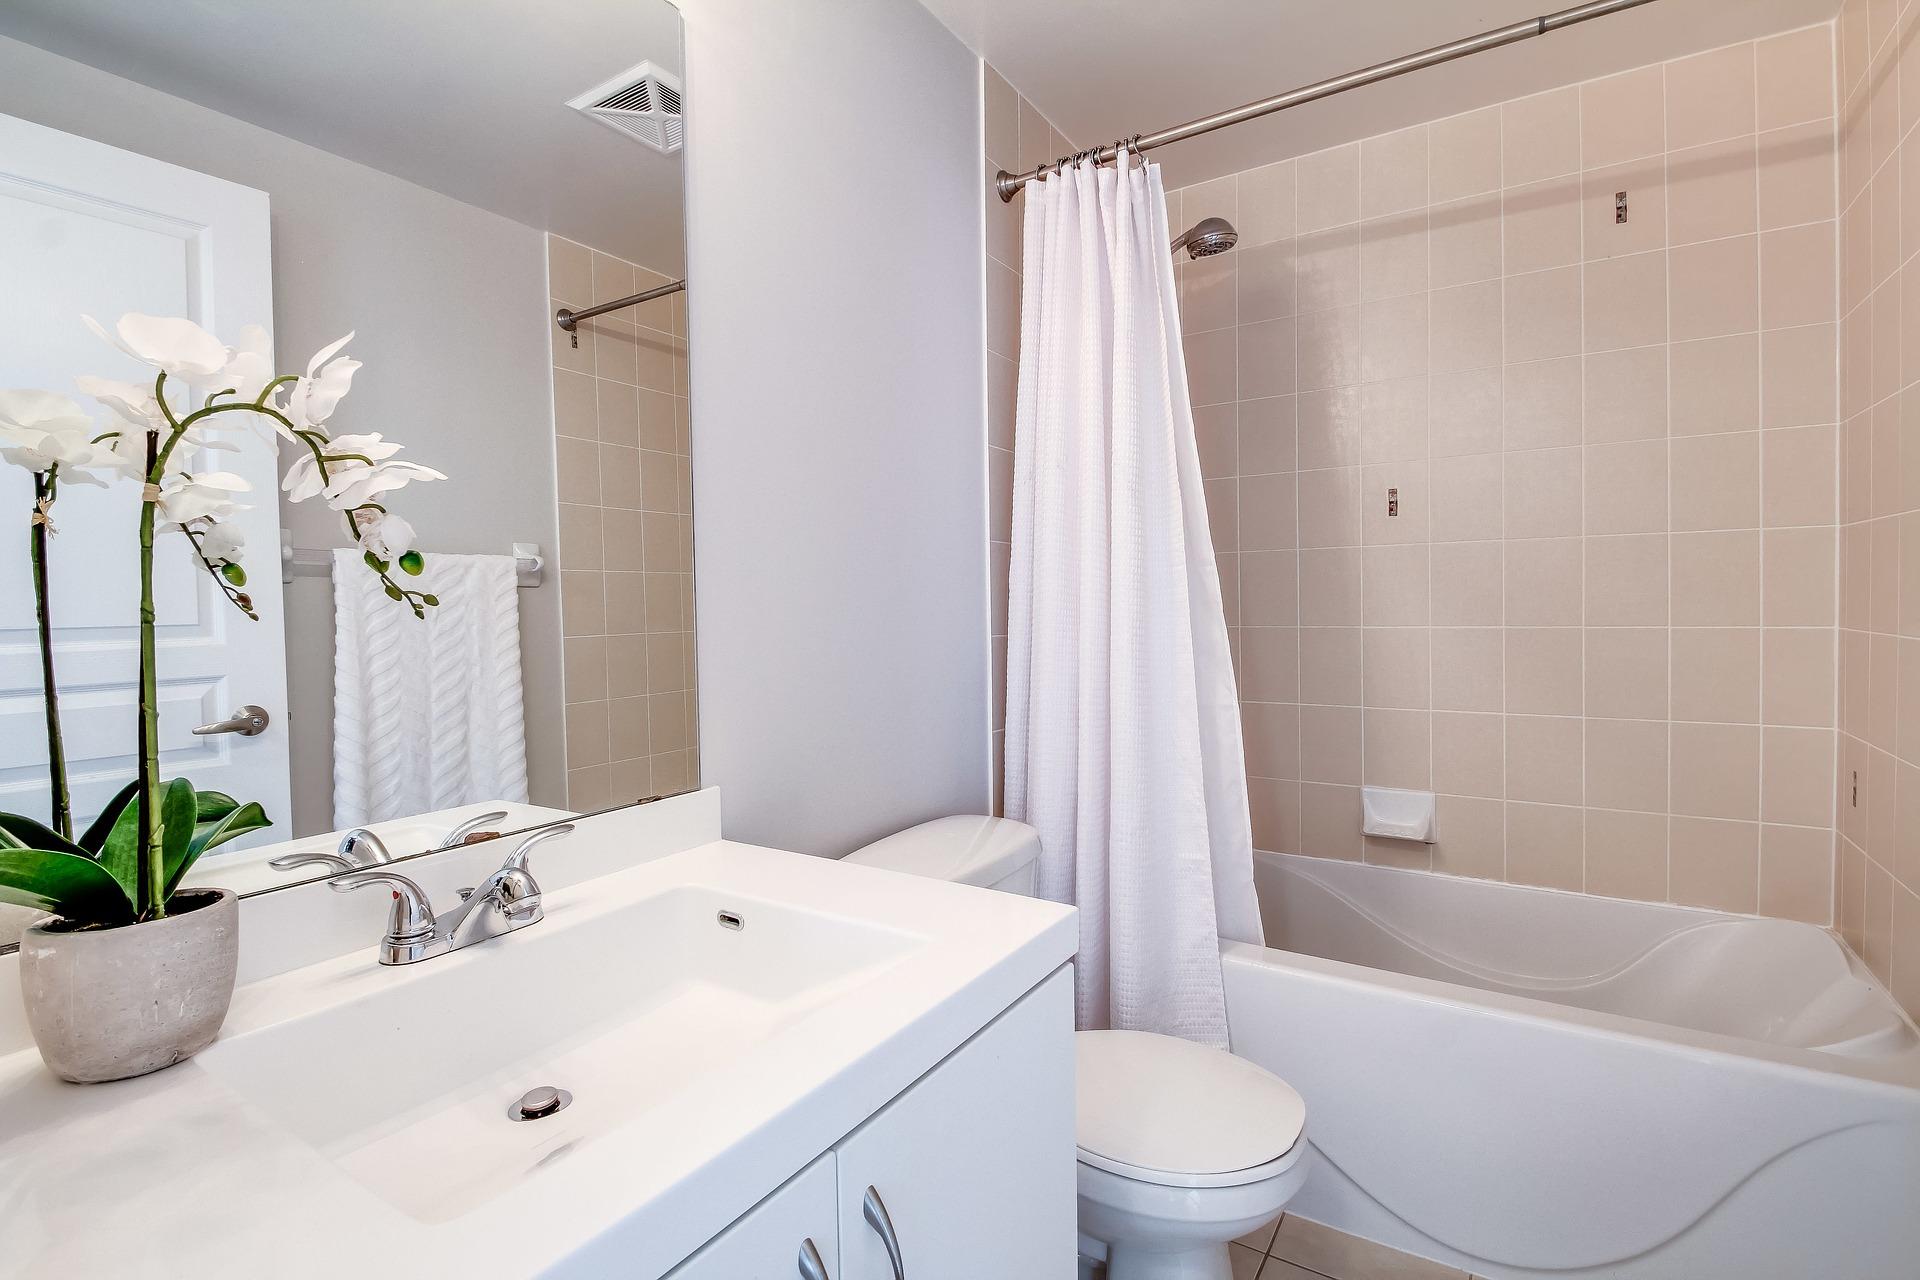 new bathroom picture